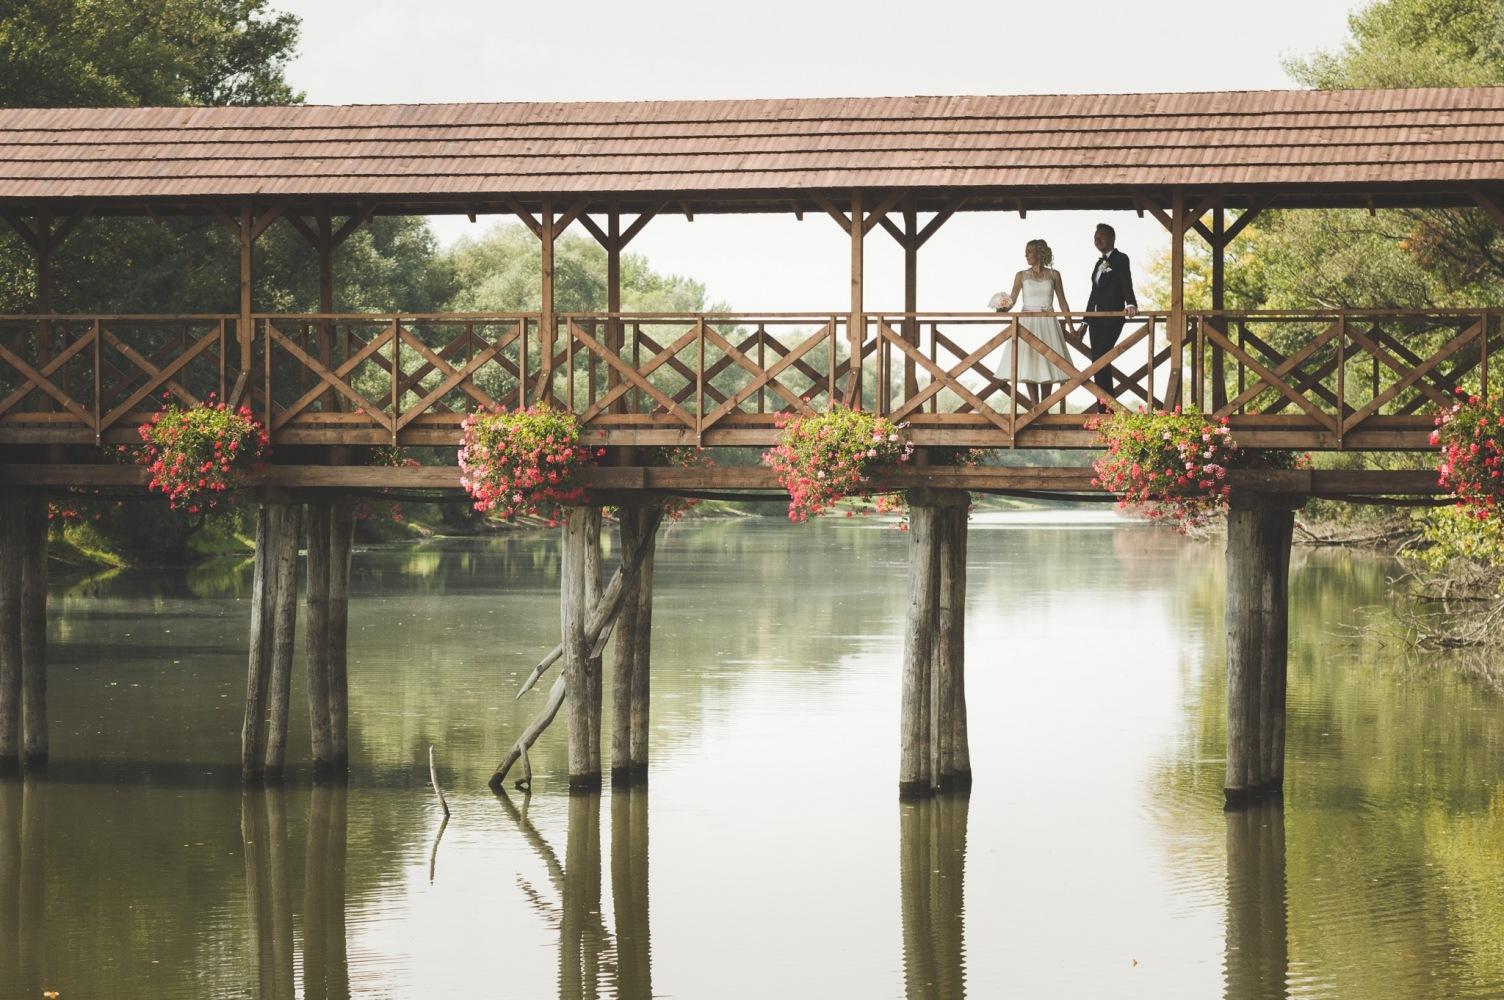 Eliska & Zdeno - Wedding day by Erik Svec